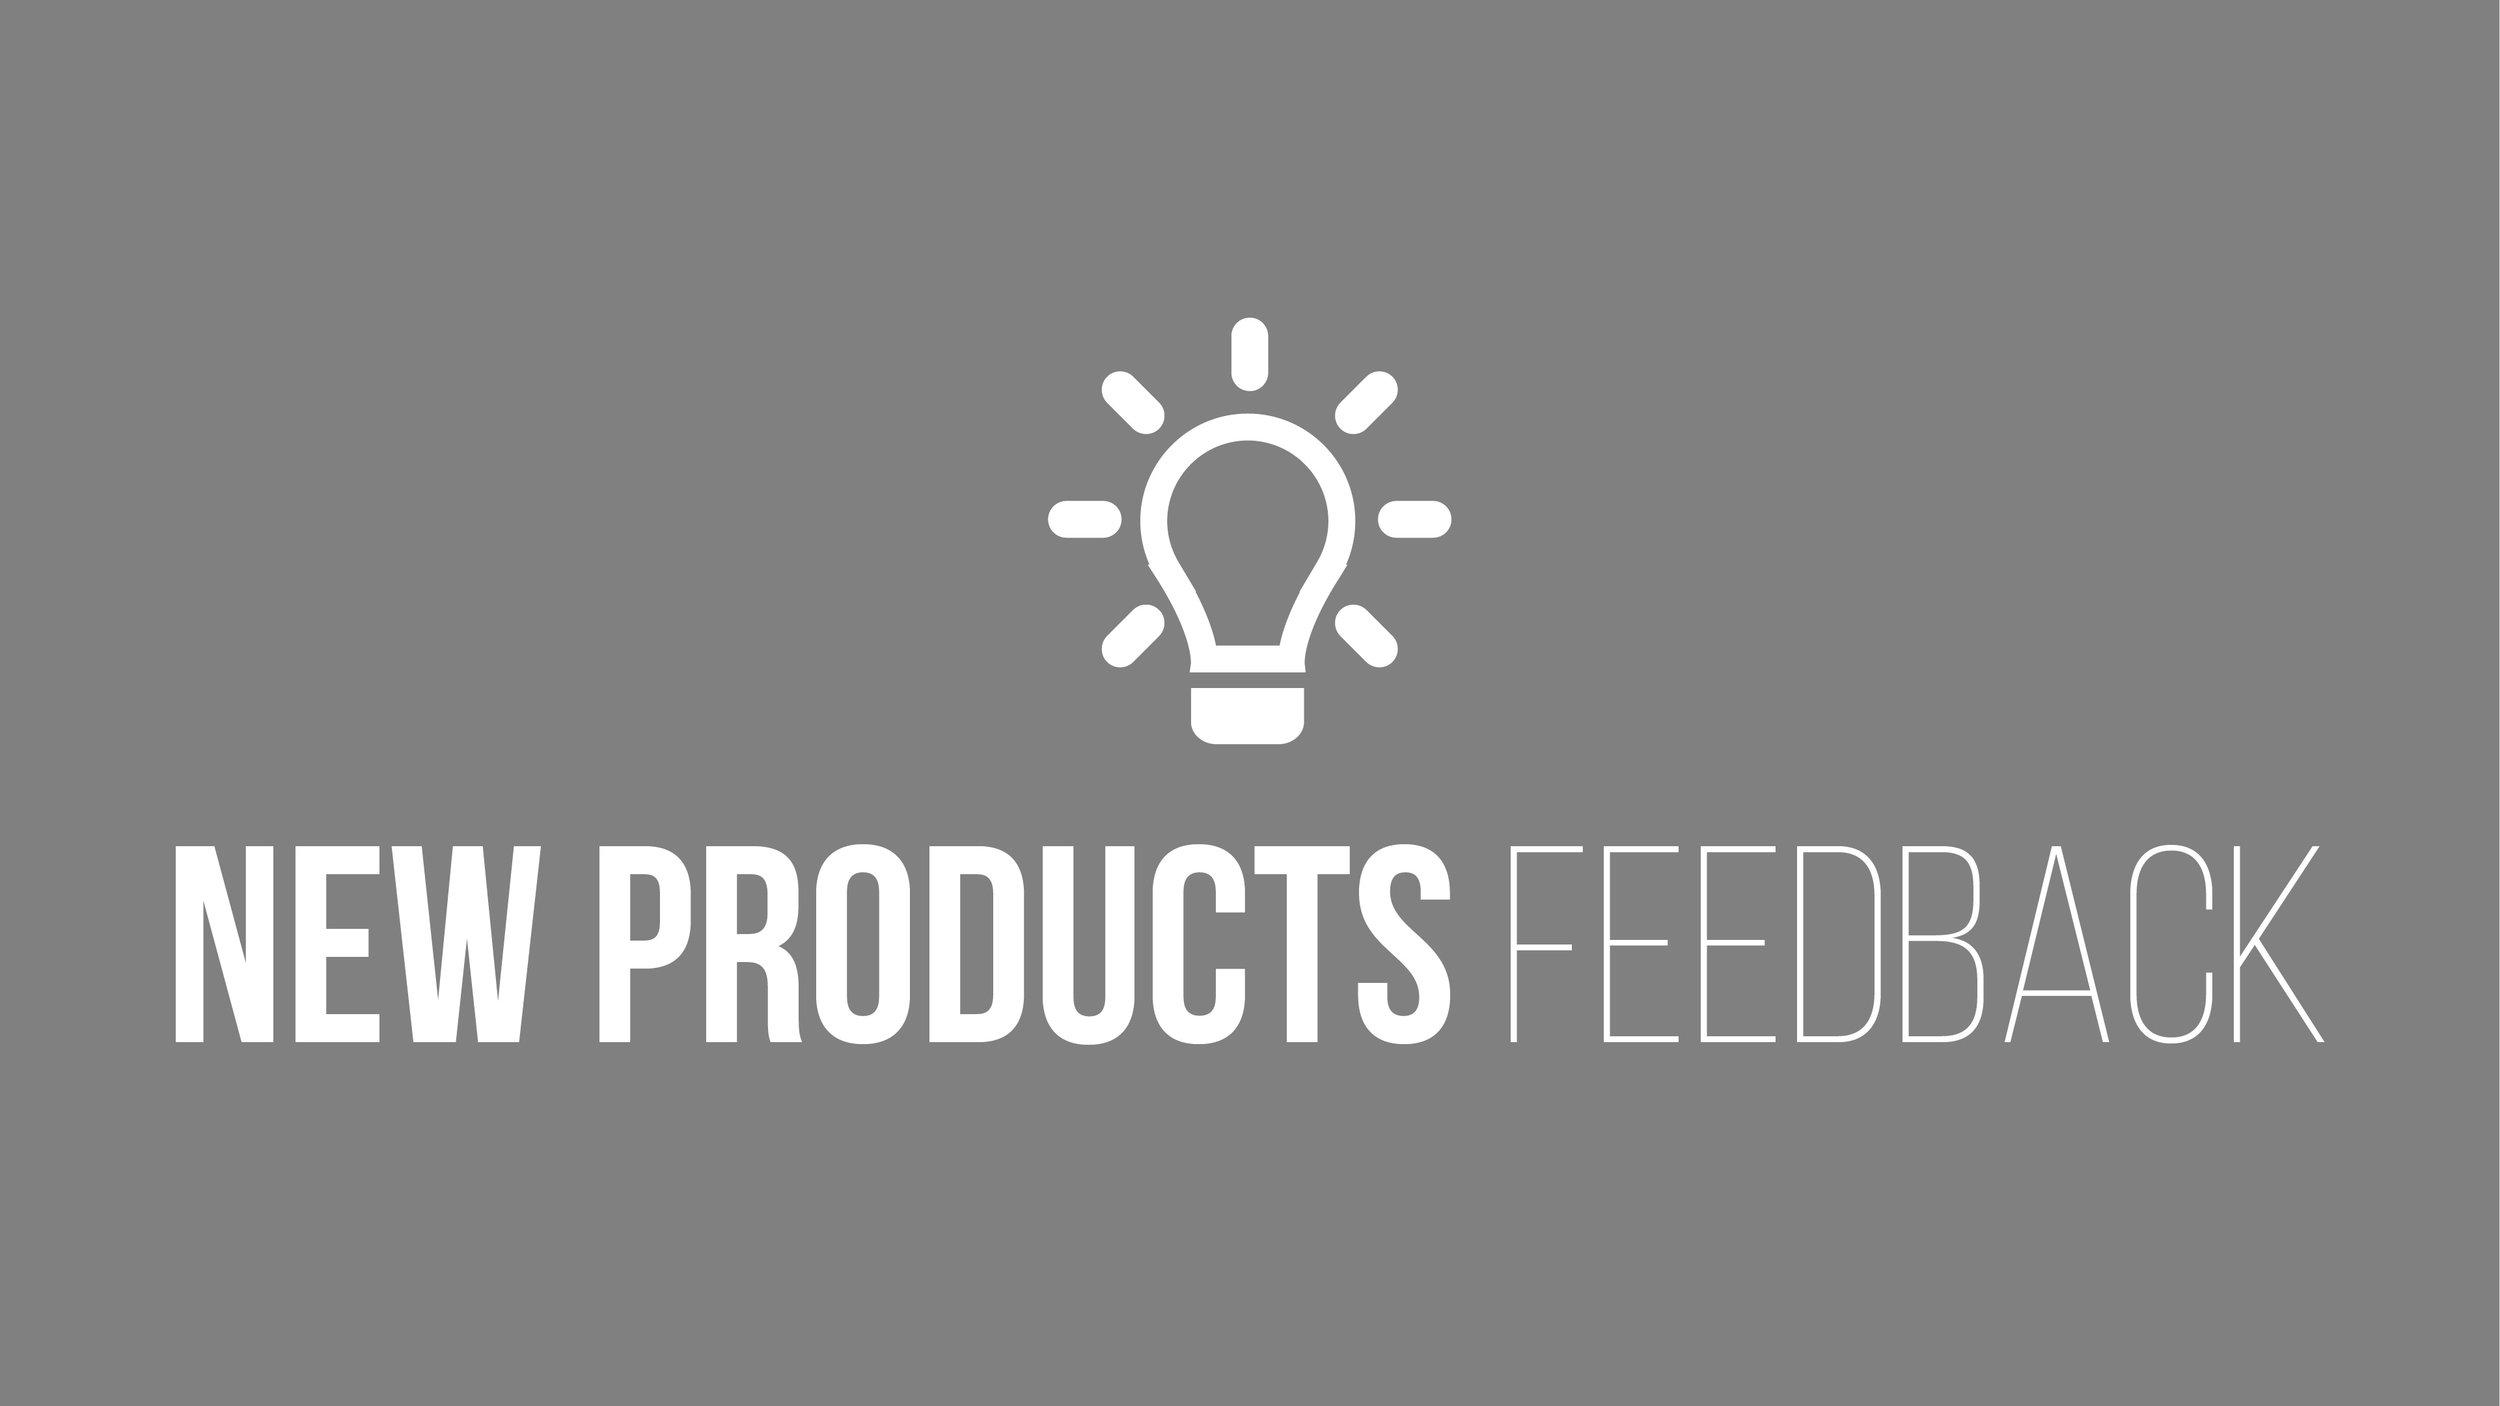 SC Assets v1.1_New Products Feedback.jpg